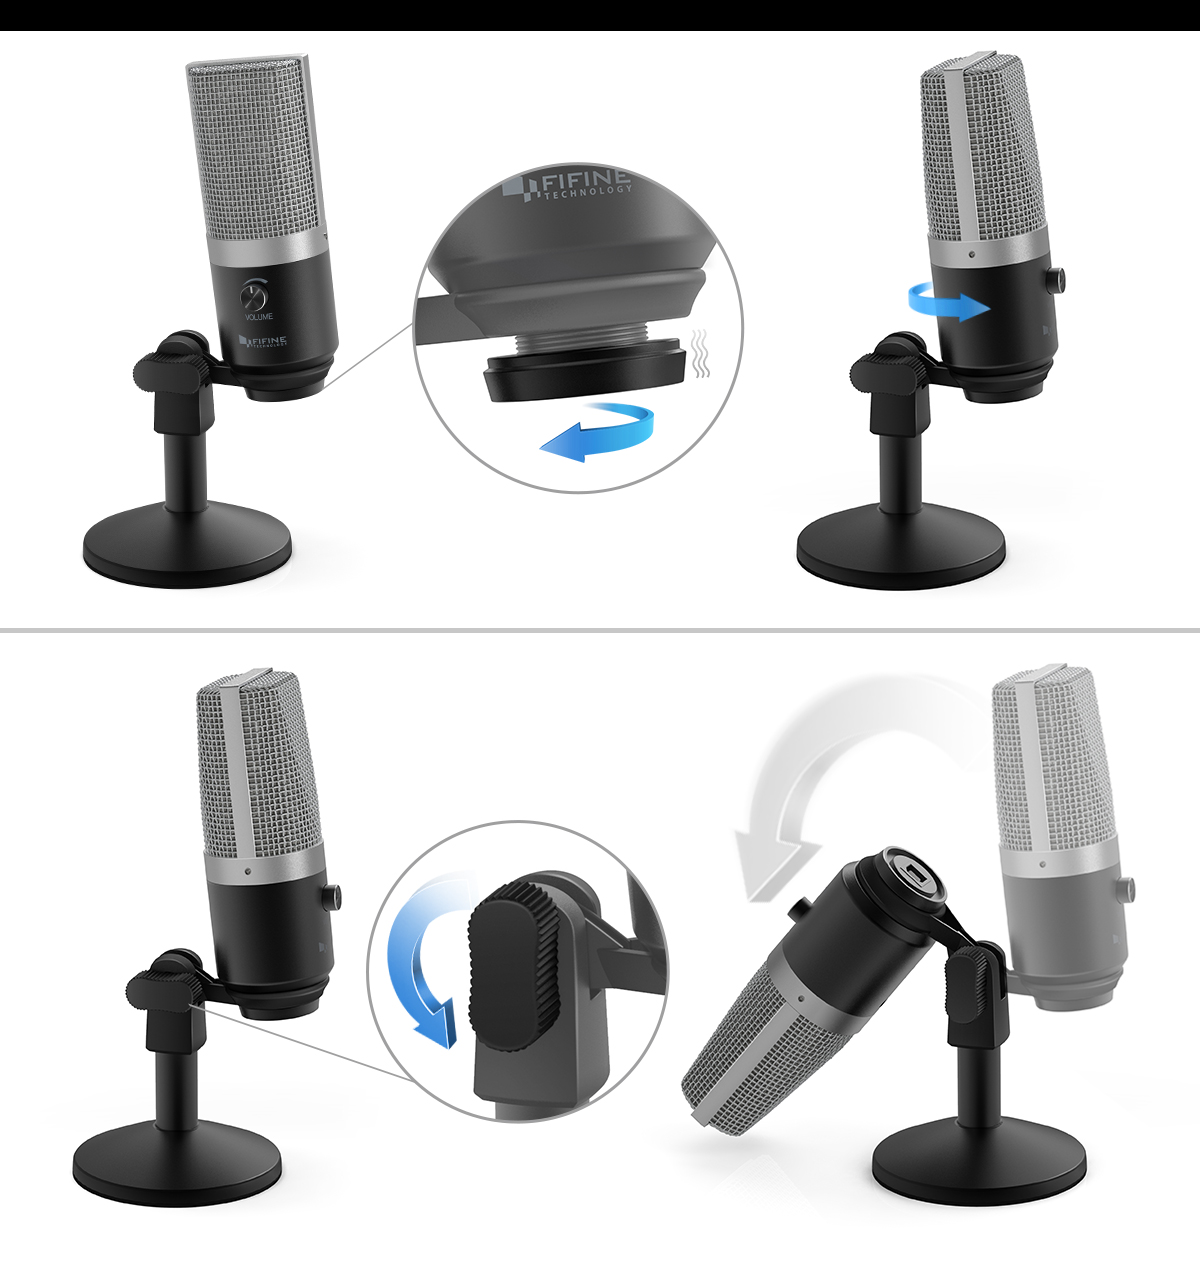 FIFINE Uni-Directional USB Microphone 16